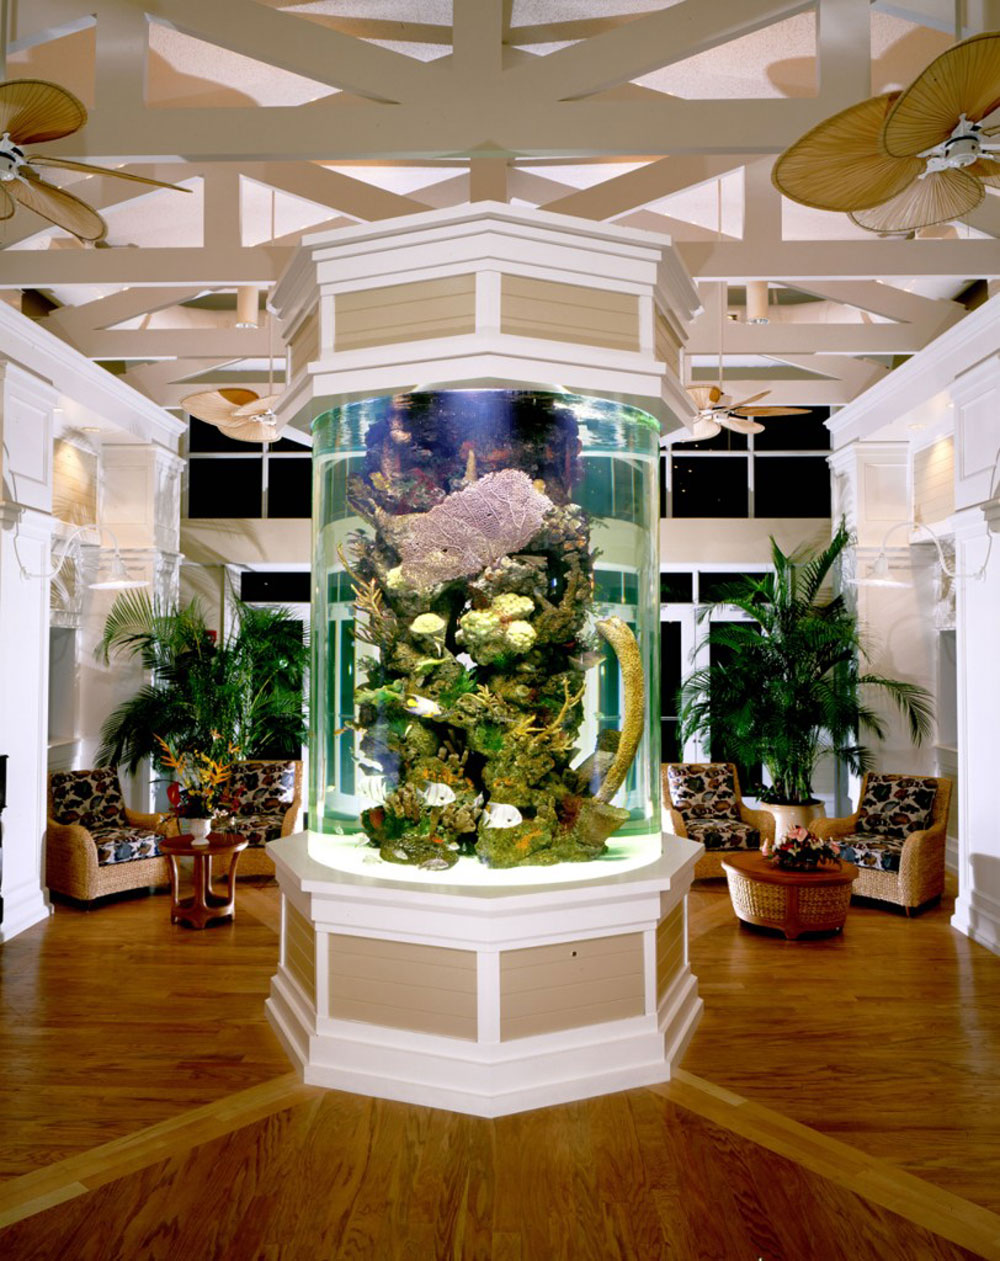 Change The Look Of Your Room With These Home Aquarium Tanks - Home aquarium design